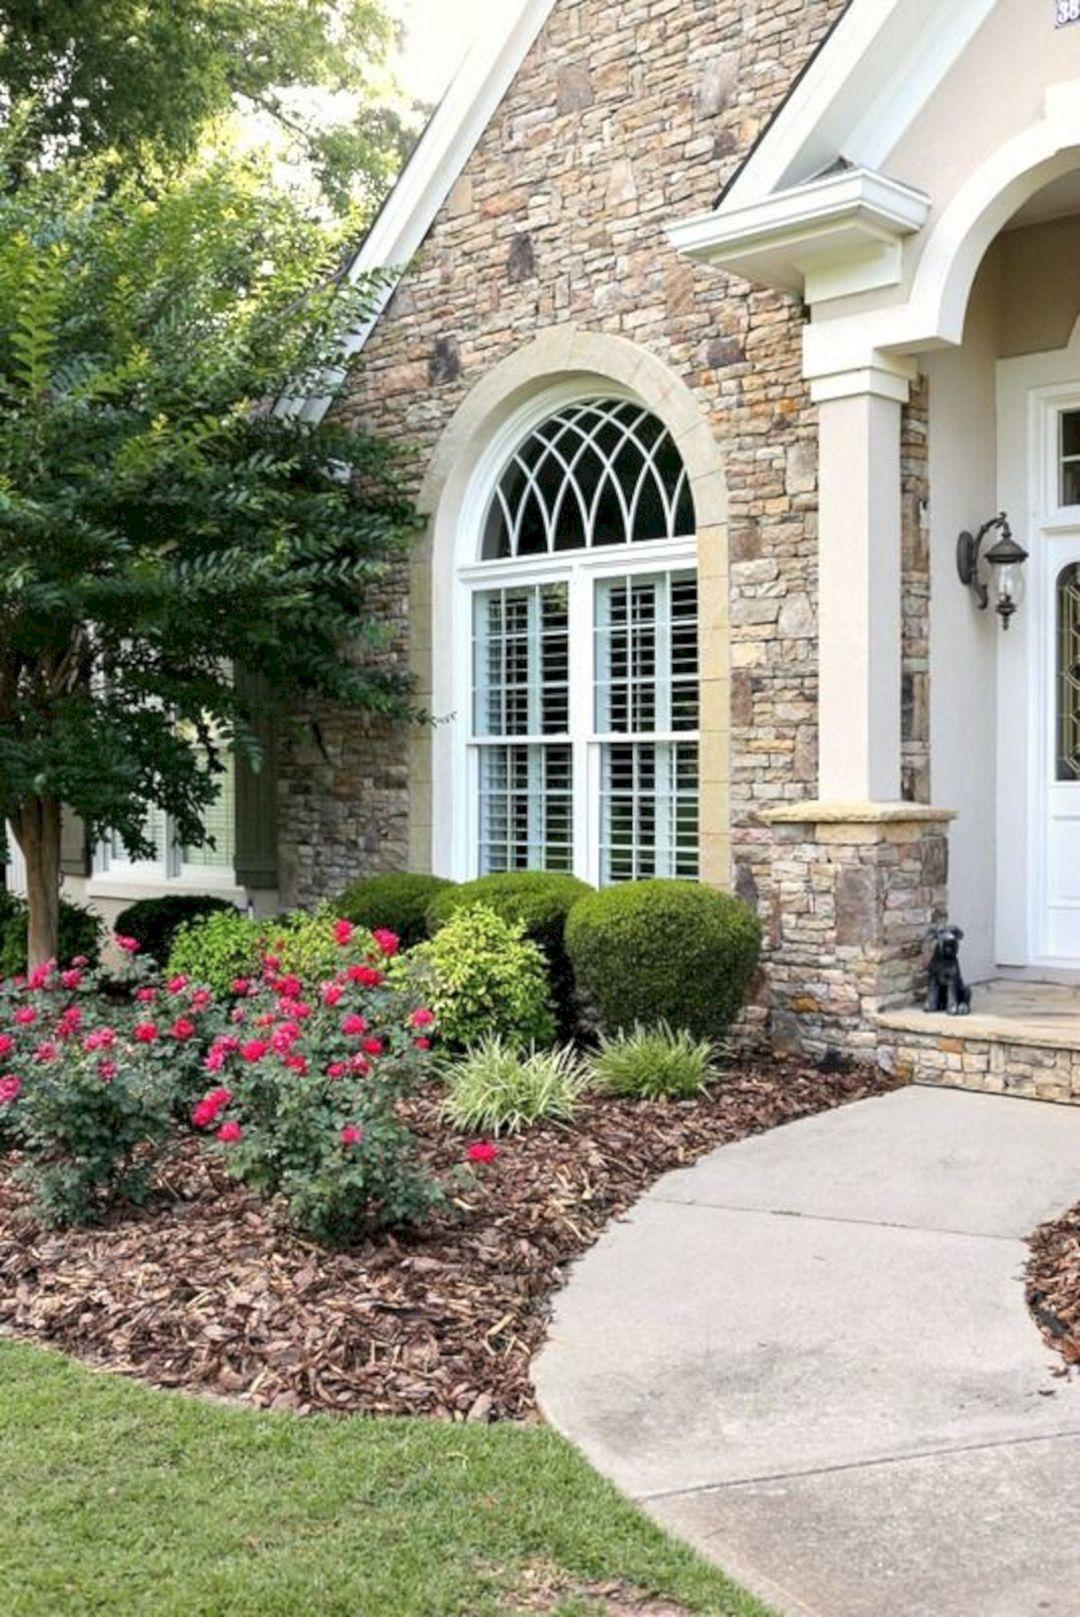 inspiring 50 beautiful front yard landscaping ideas https on front yard landscaping ideas id=71259